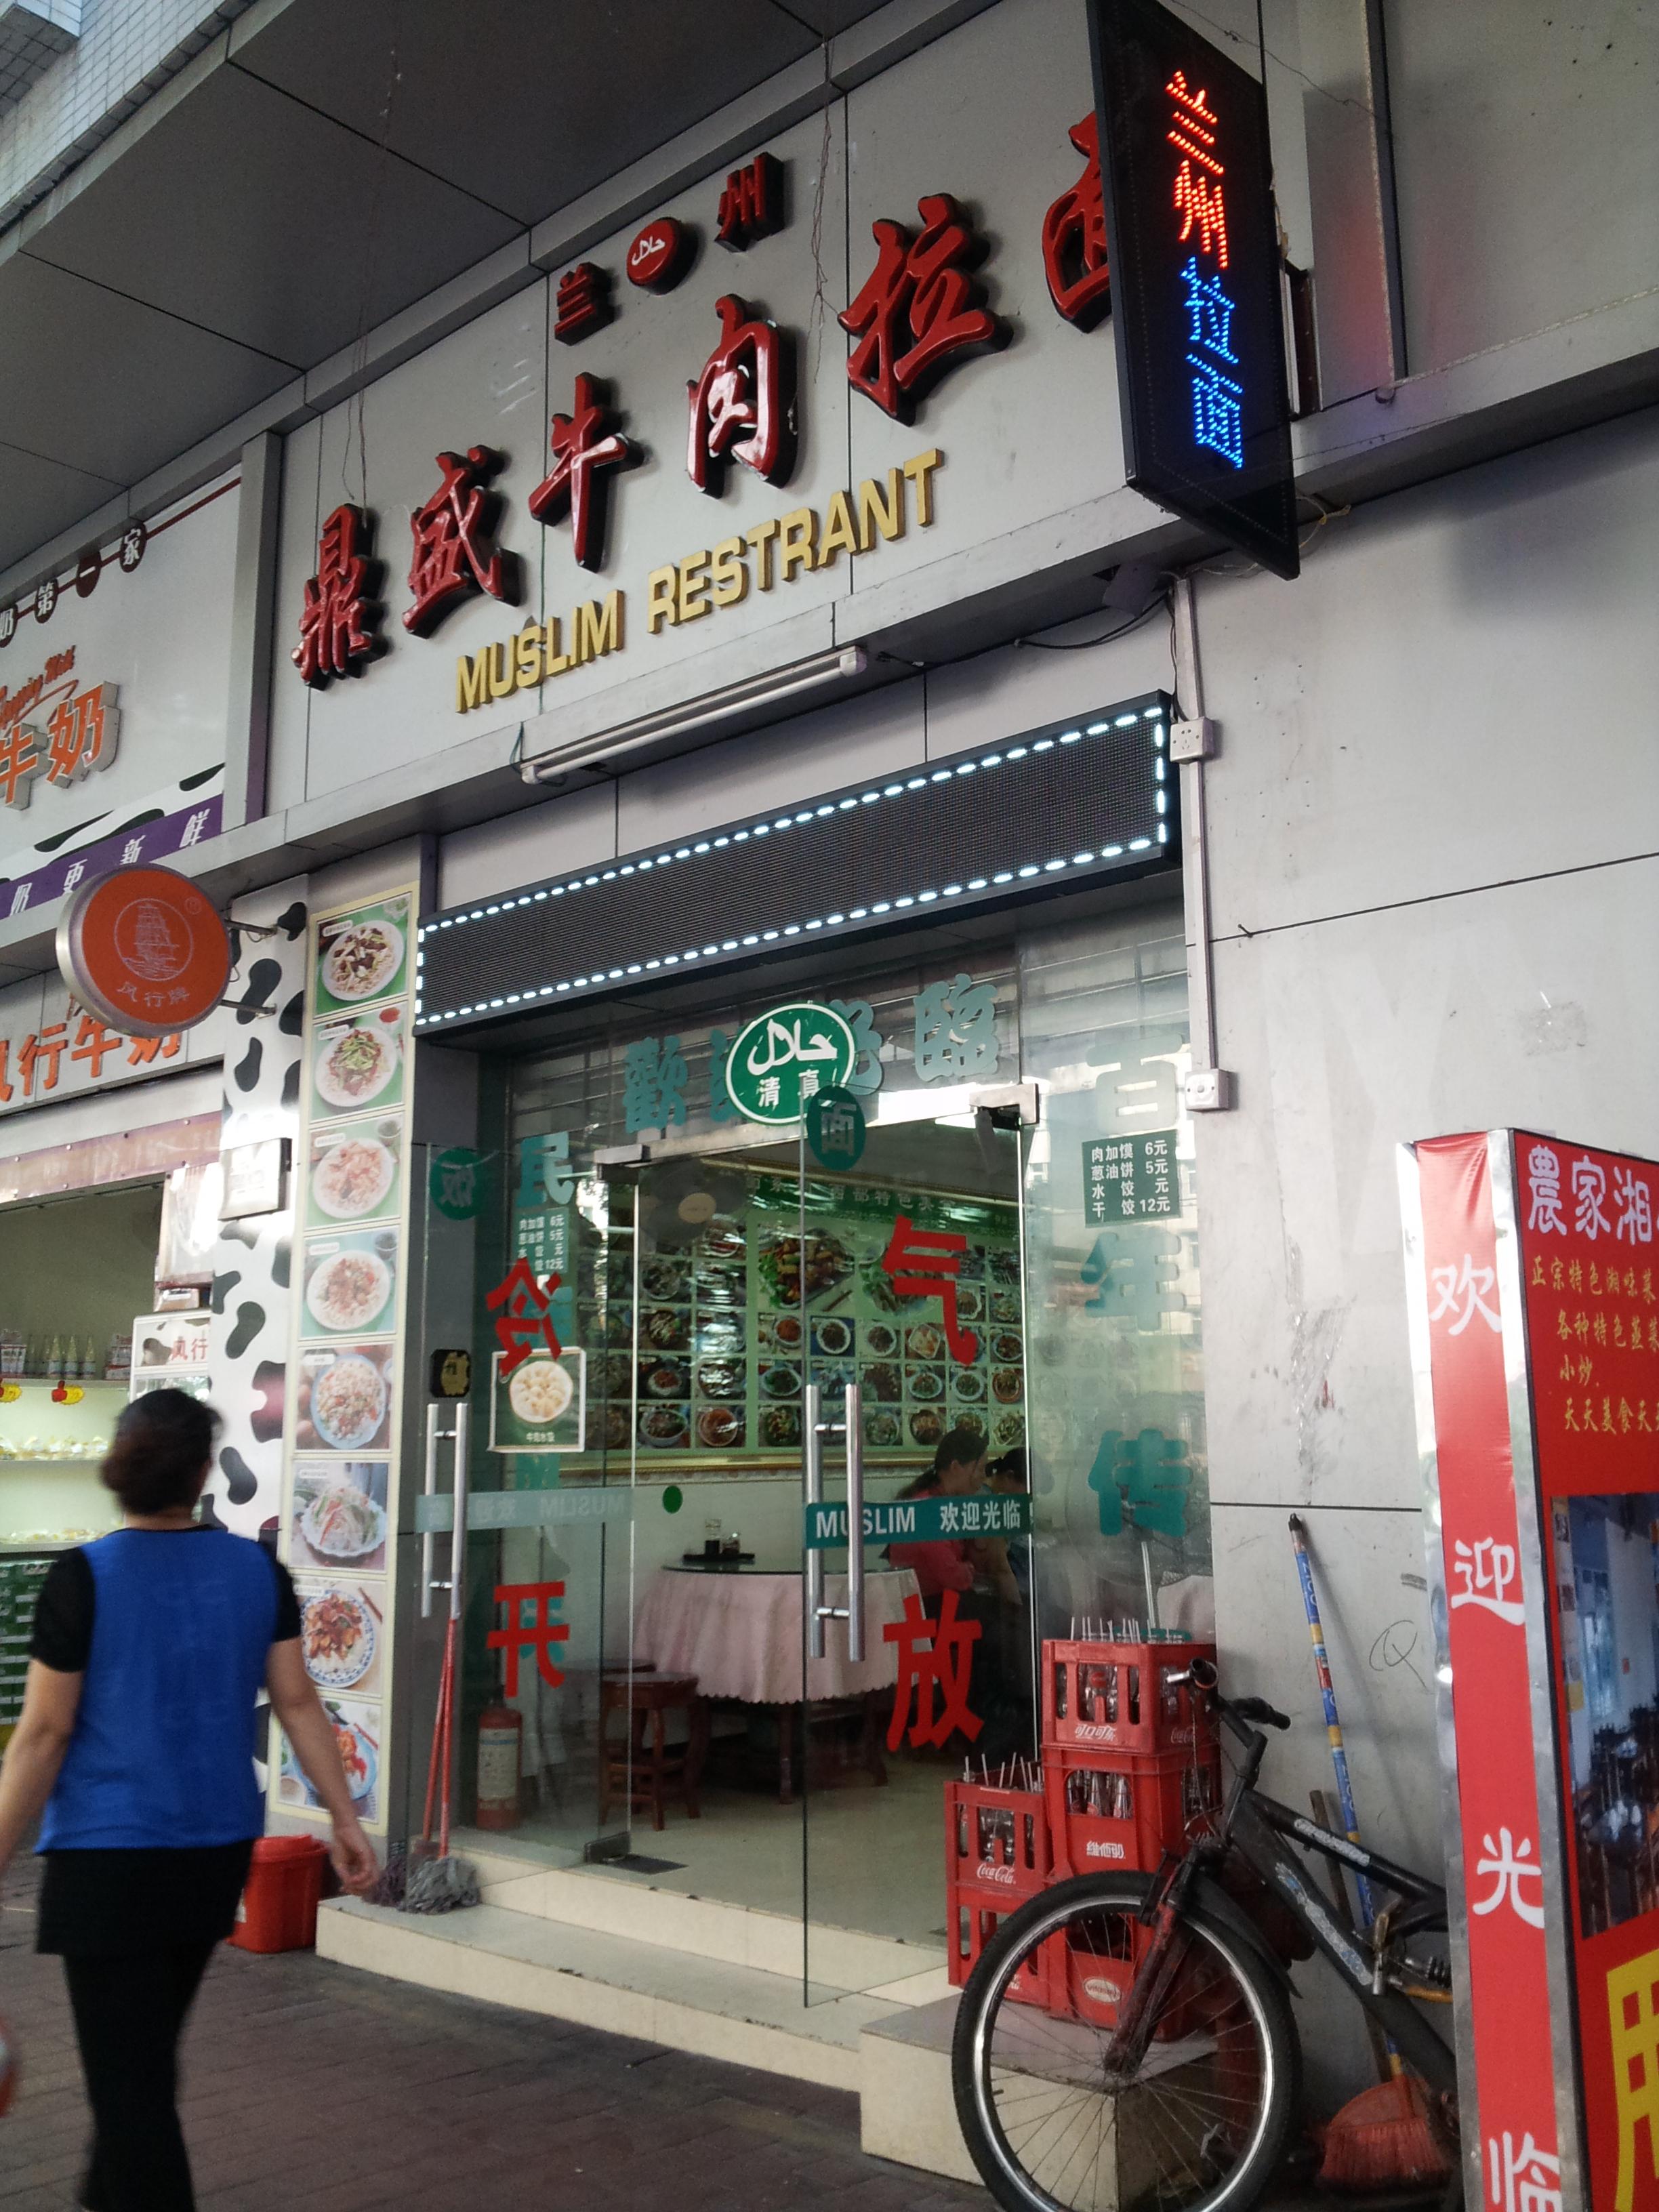 muslim restaurant guangzhou